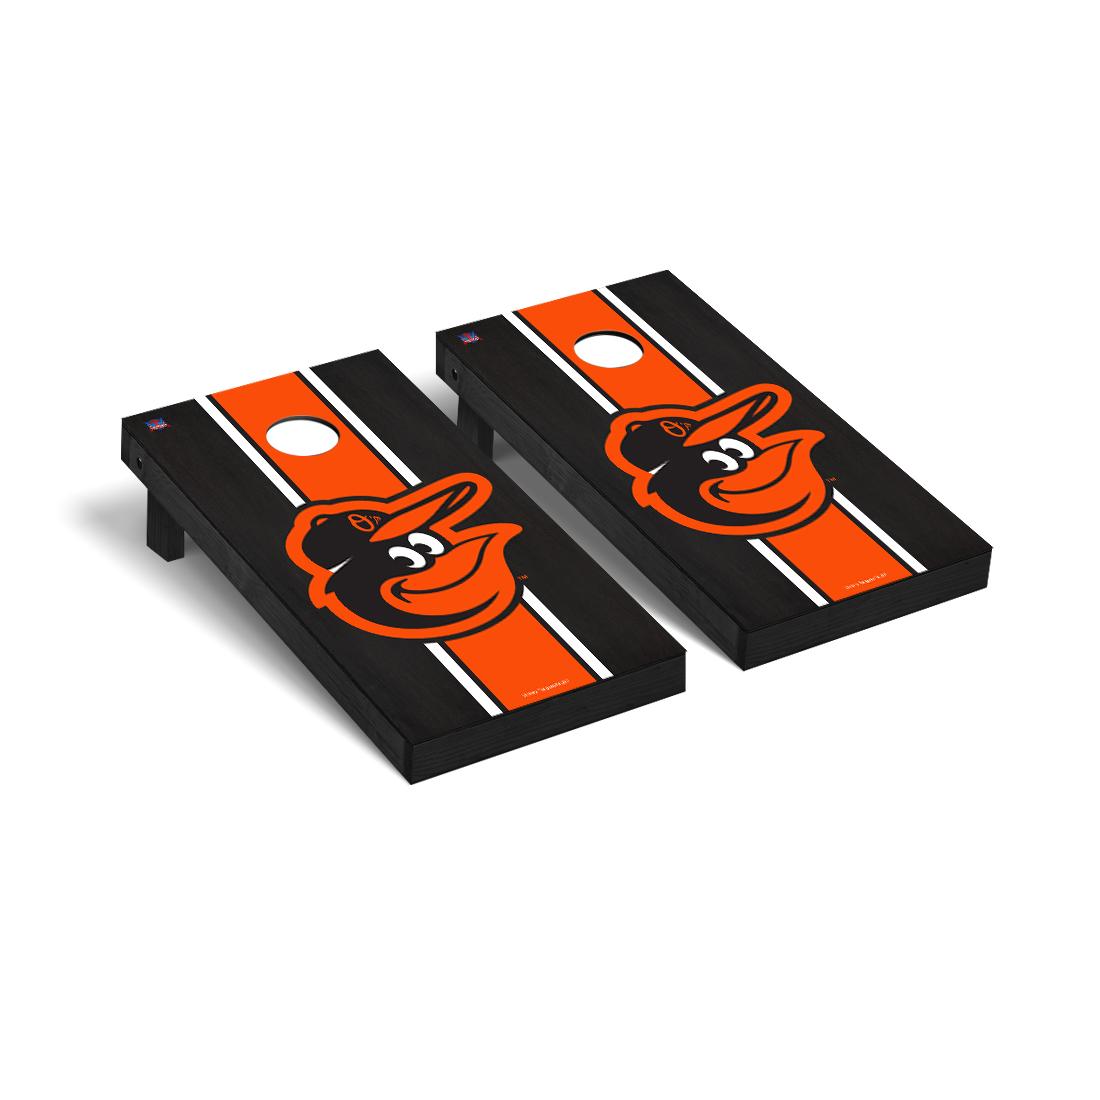 Baltimore Orioles MLB Baseball Cornhole Game Set Onyx Stained Stripe Version